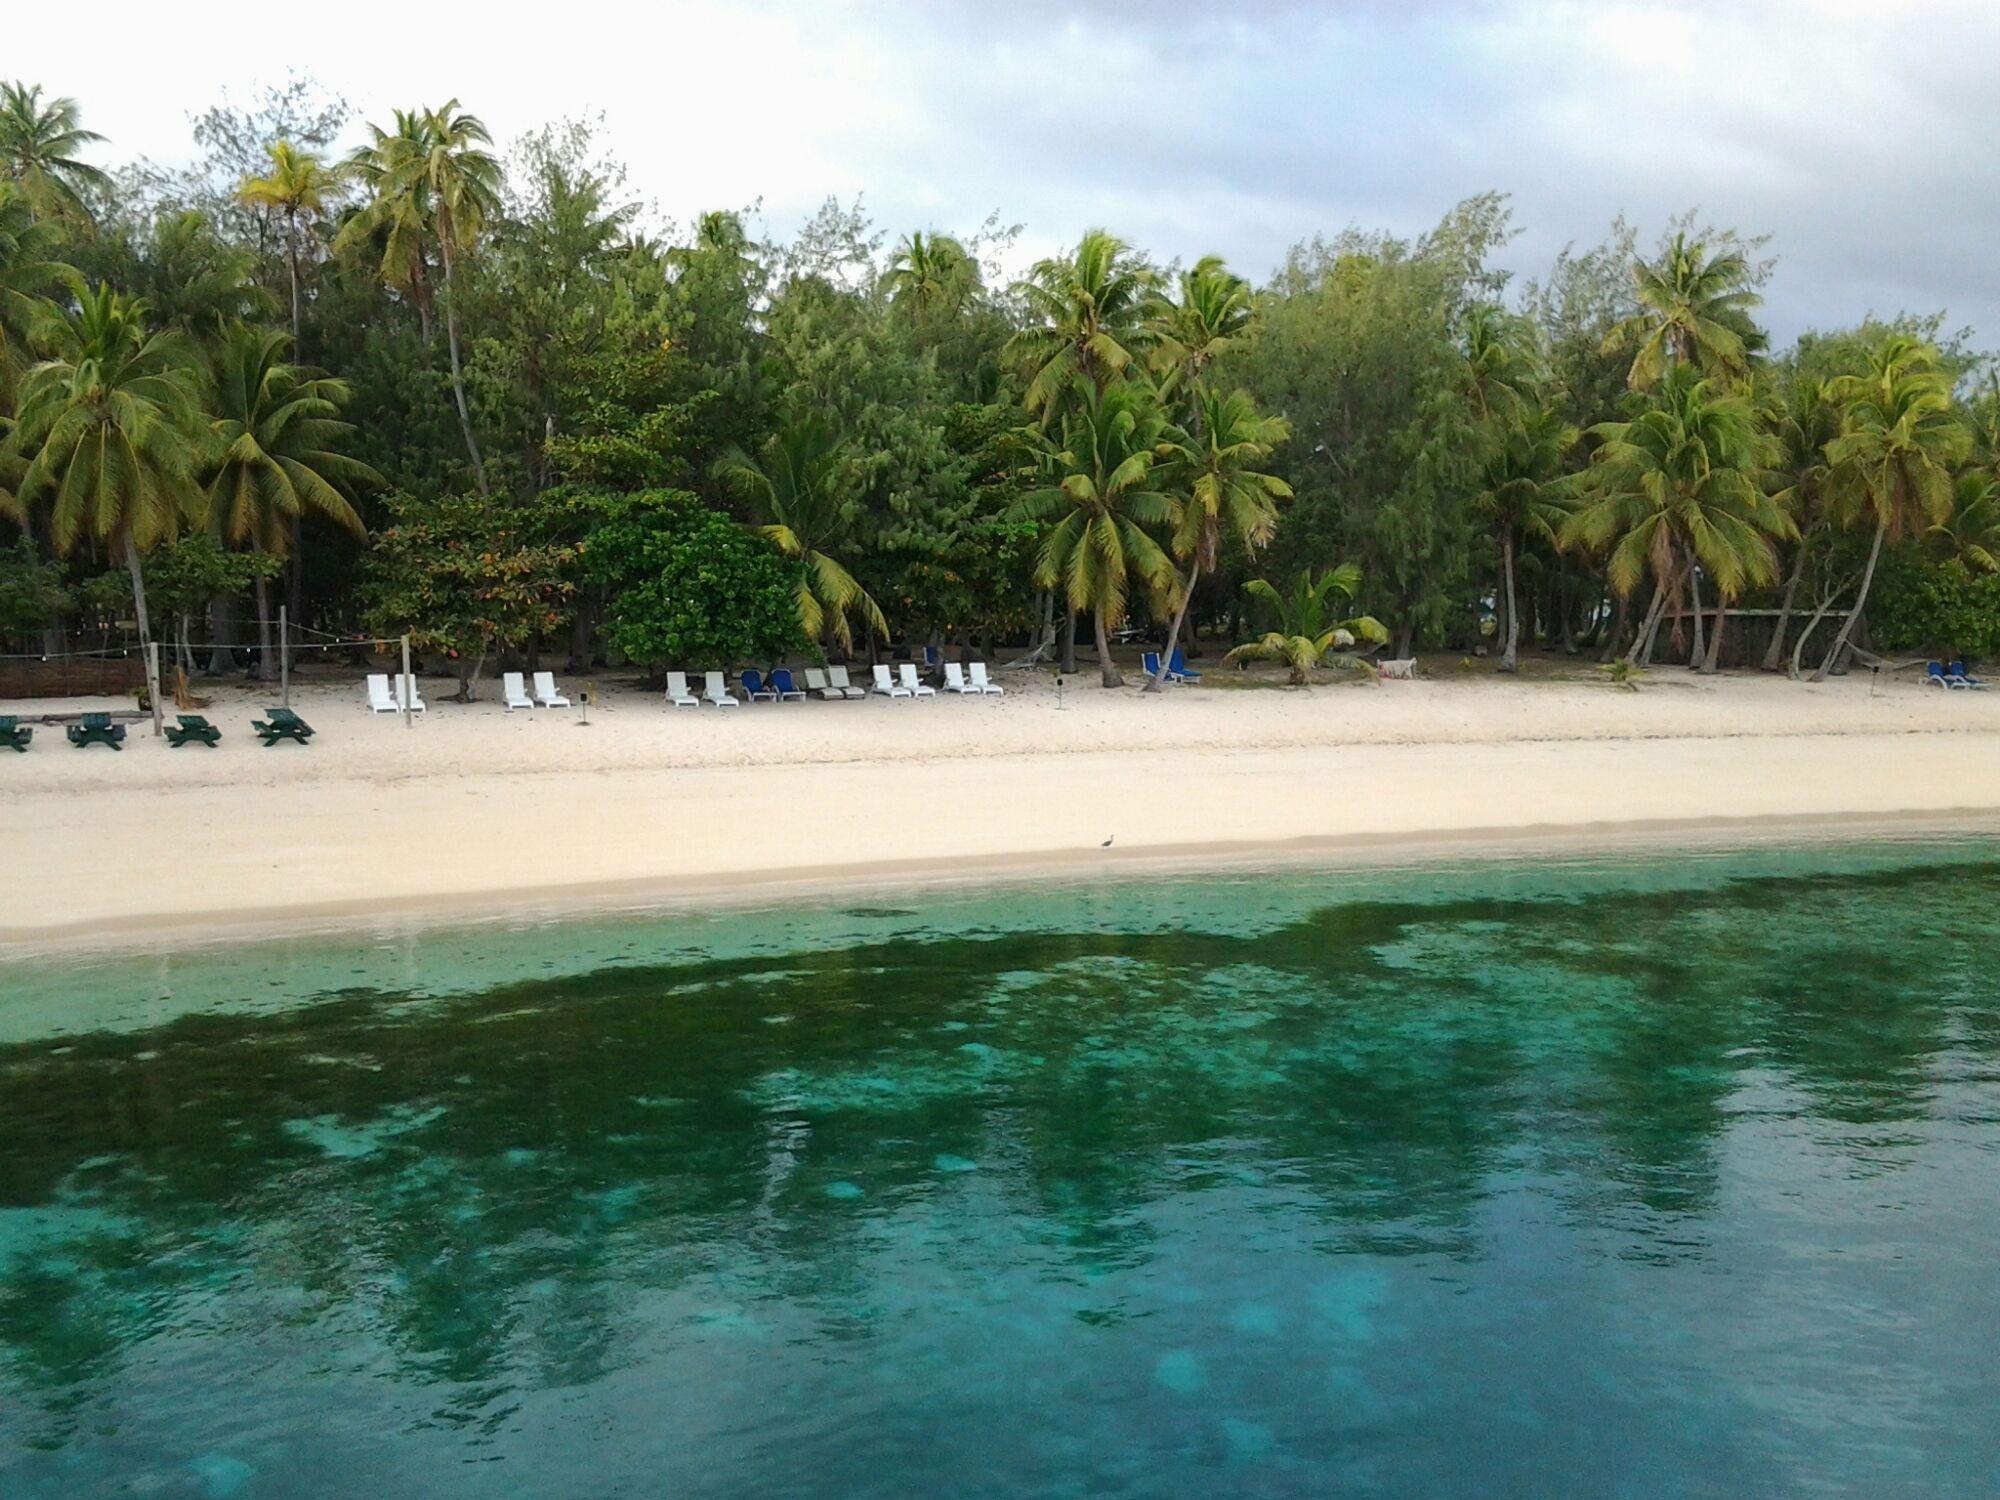 https://kiwitravelwriter.wordpress.com/2015/05/15/life-on-the-ocean-waves/ #fijiprincess